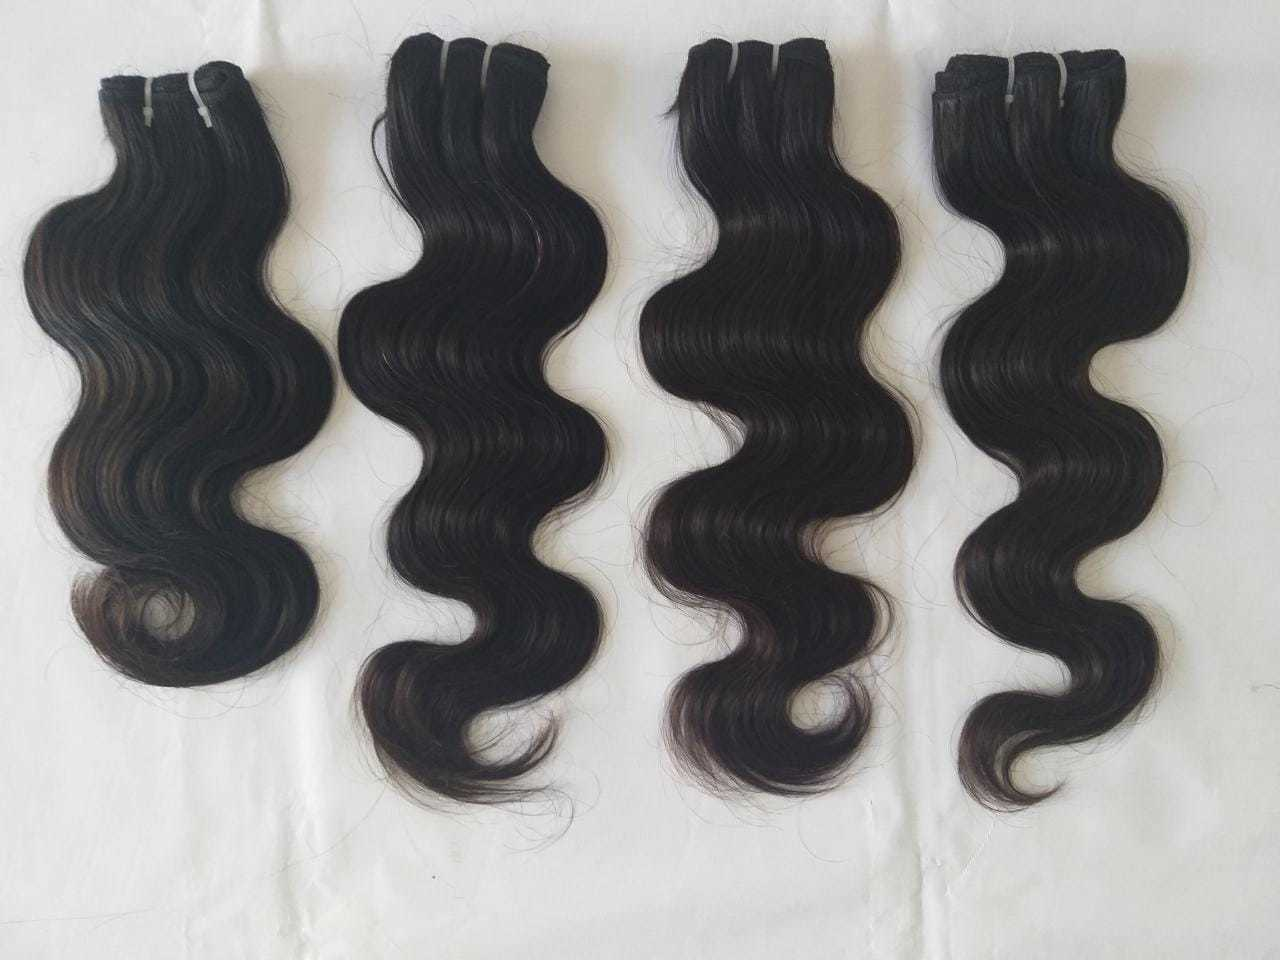 Natural body wave hair